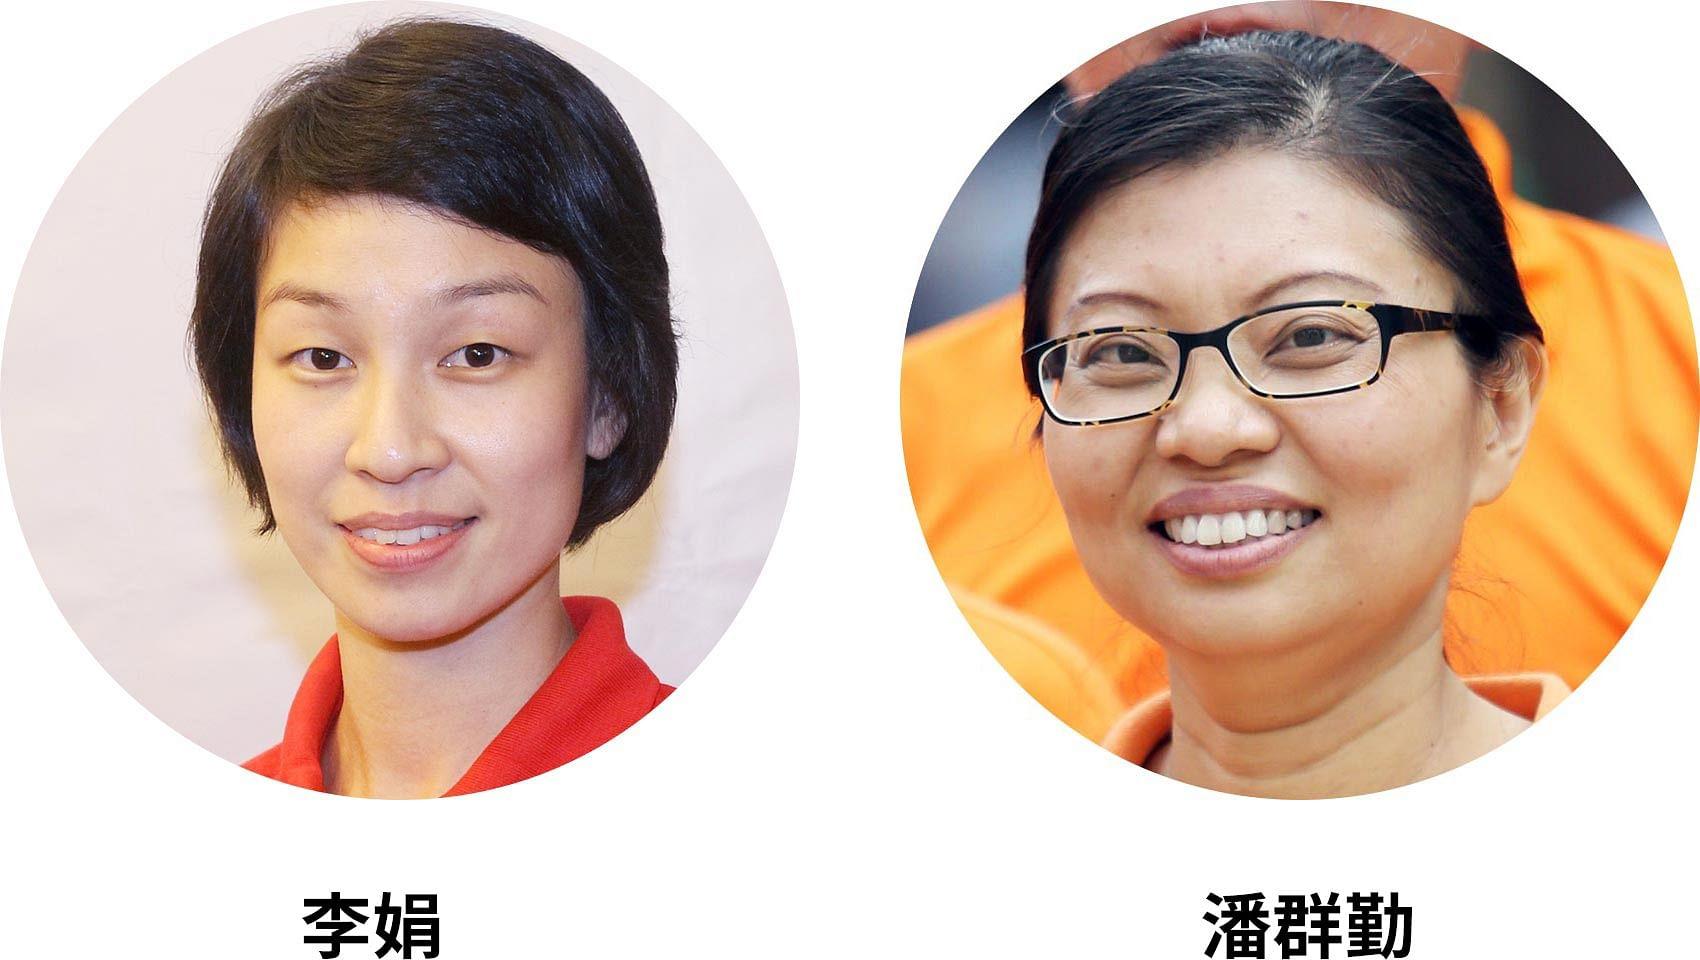 former-opposition-member-li-juan-pan-qun-qin.jpg